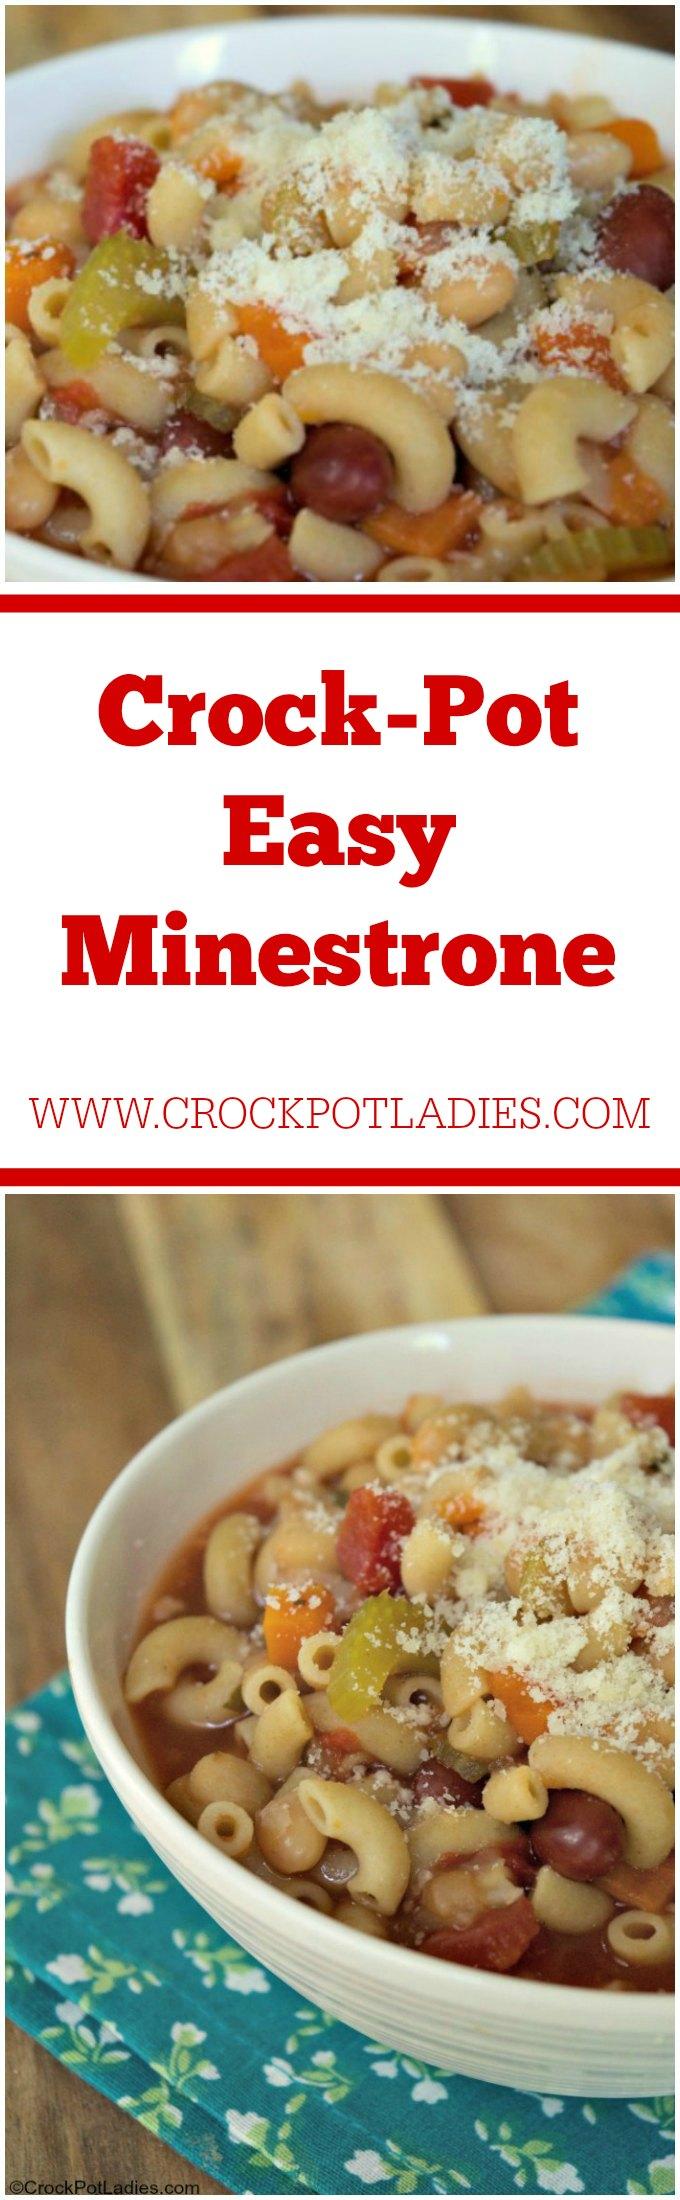 Crock-Pot Easy Minestrone